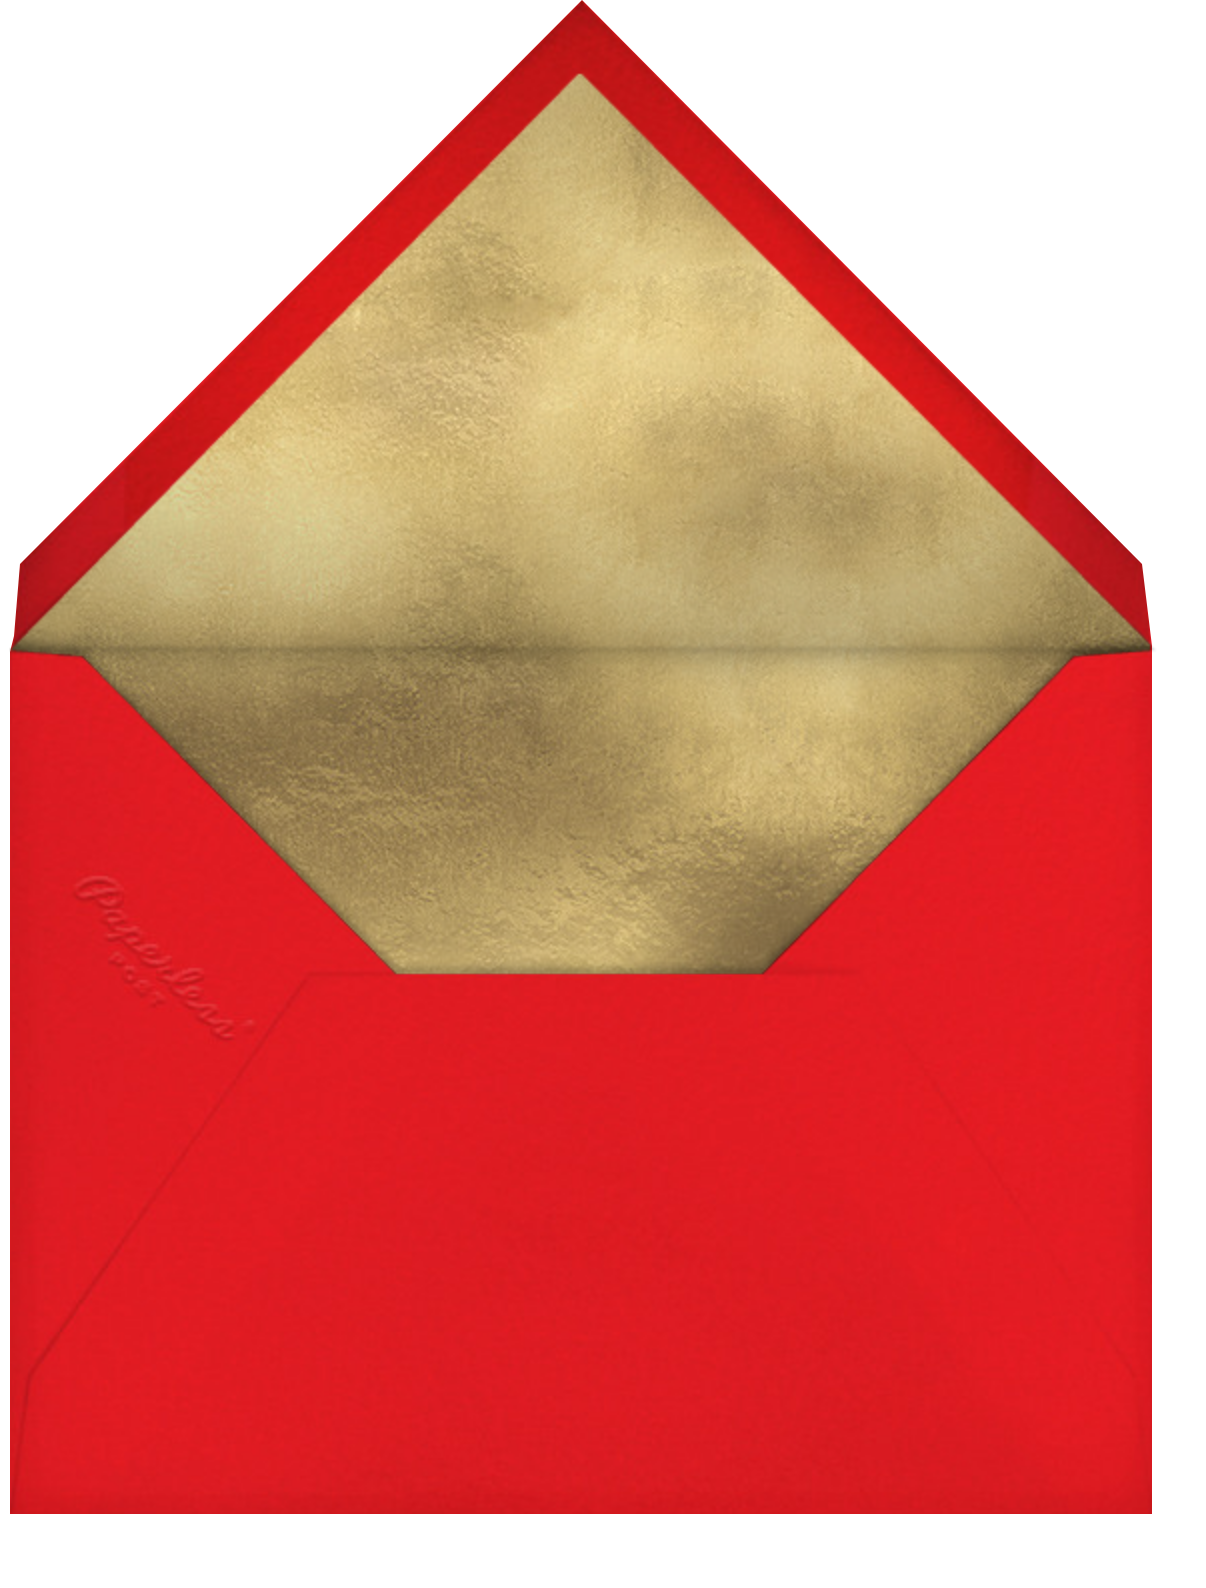 Candy Cane Delight - Meri Meri - Holiday cards - envelope back